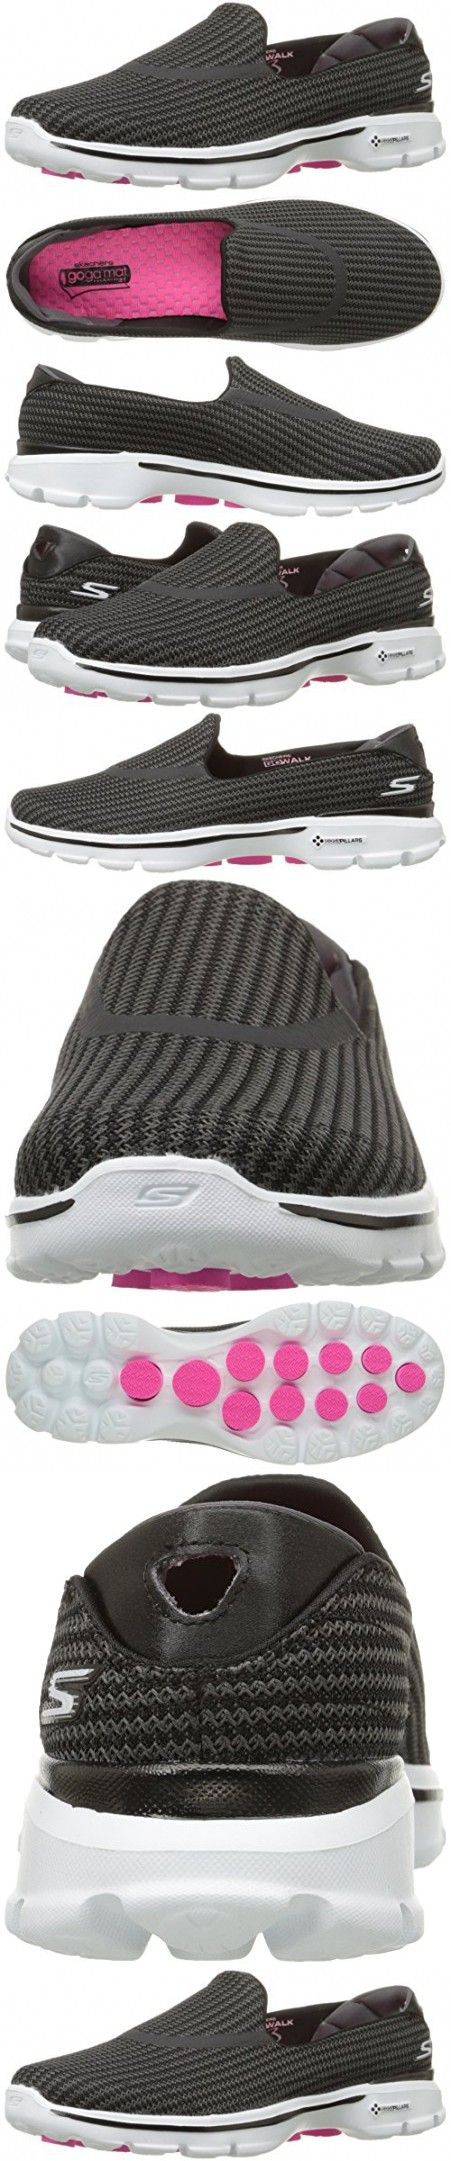 Zapatillas para caminar RYKA Women's Sky, Negra / Rosa, 10.5 M US